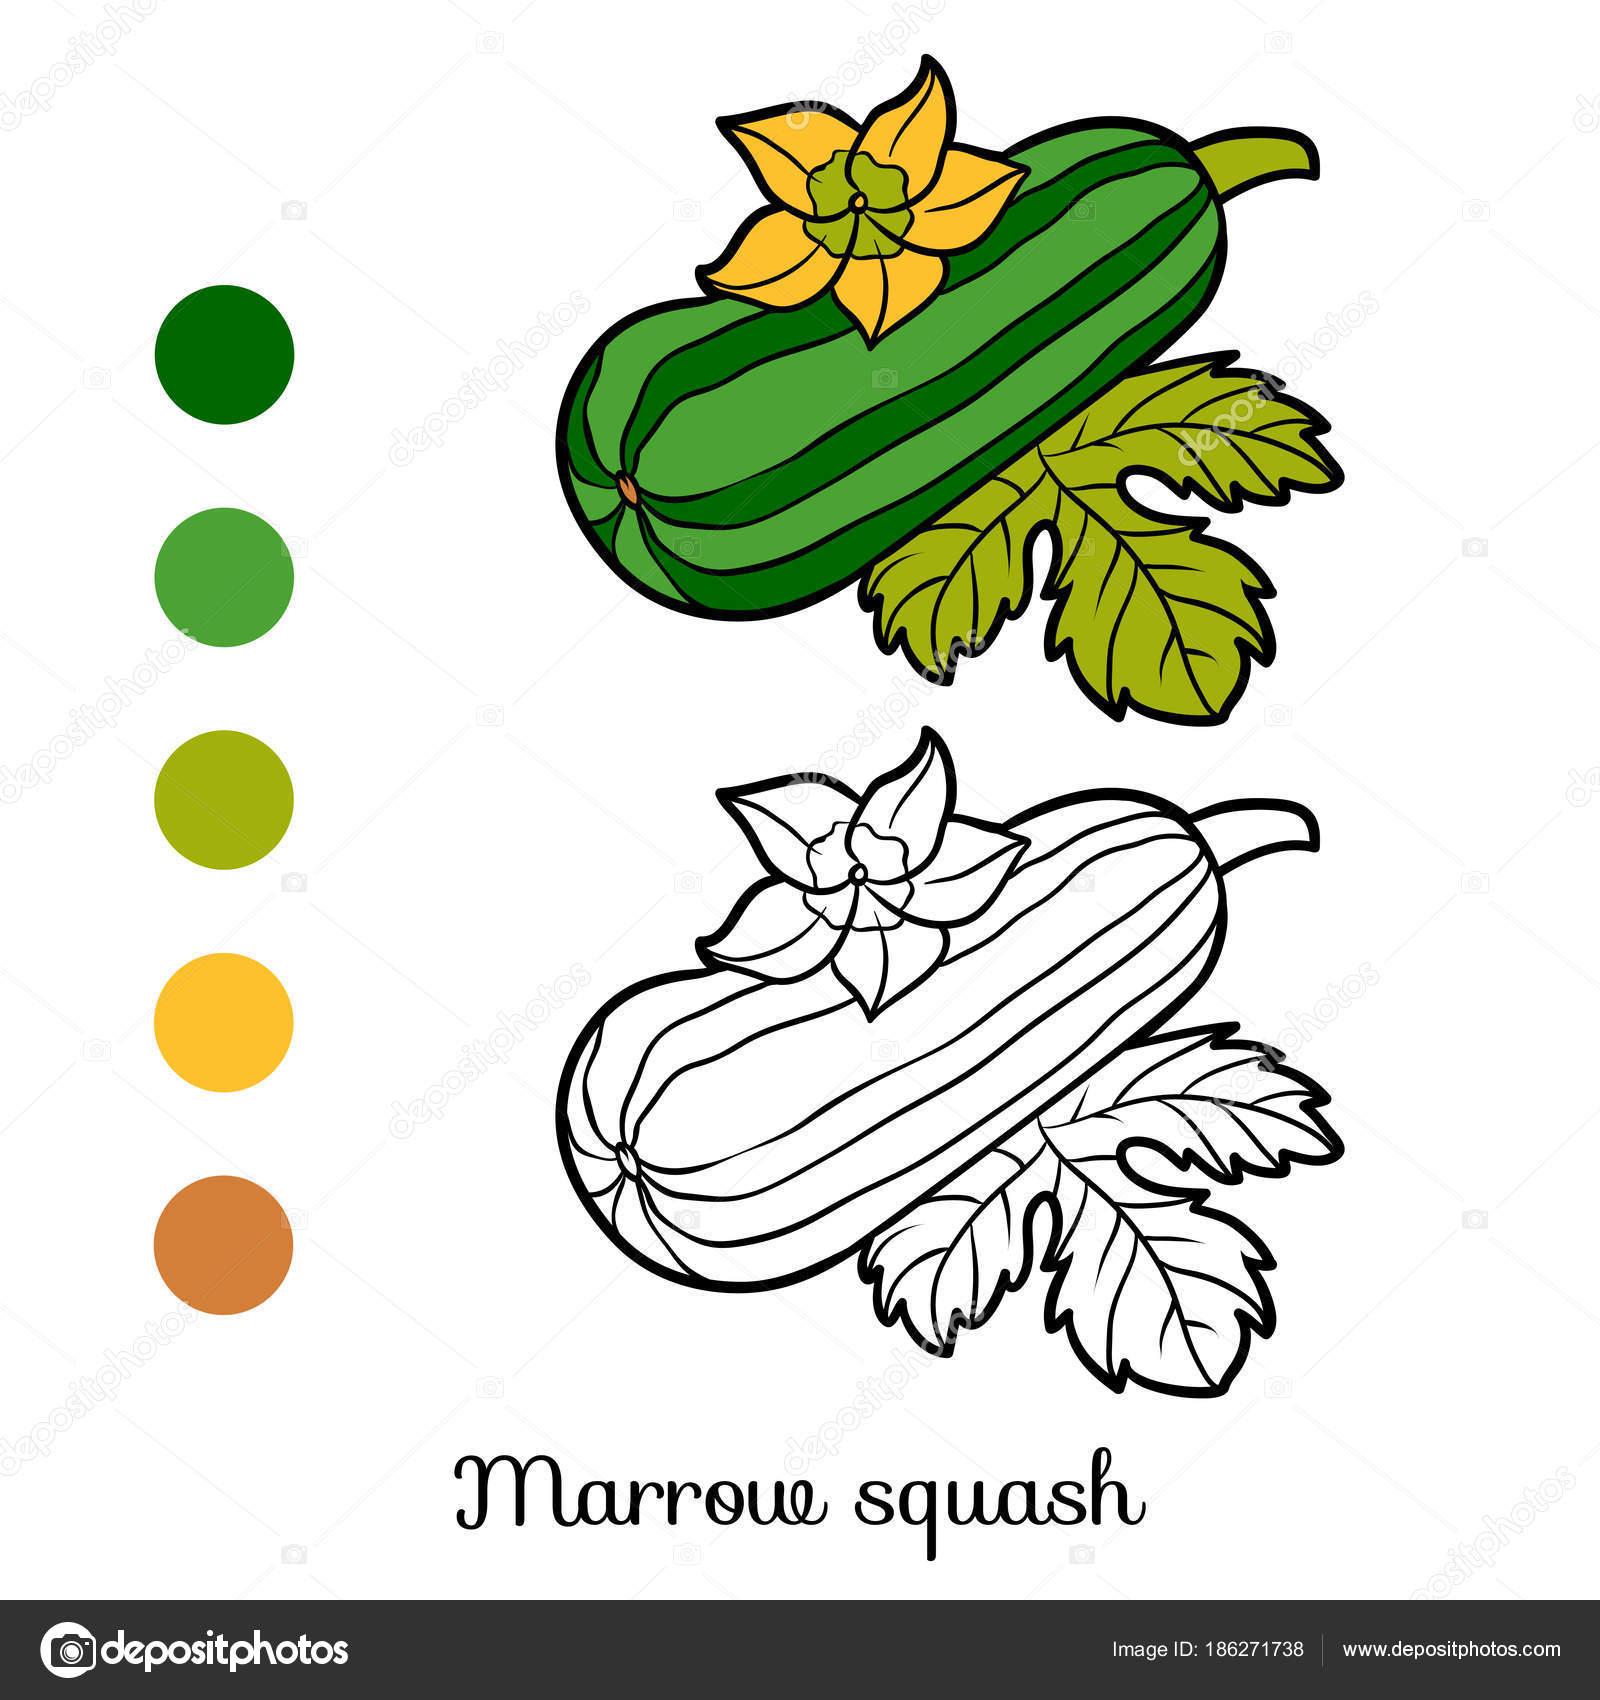 Coloring book, Marrow squash — Stock Vector © ksenya_savva #186271738